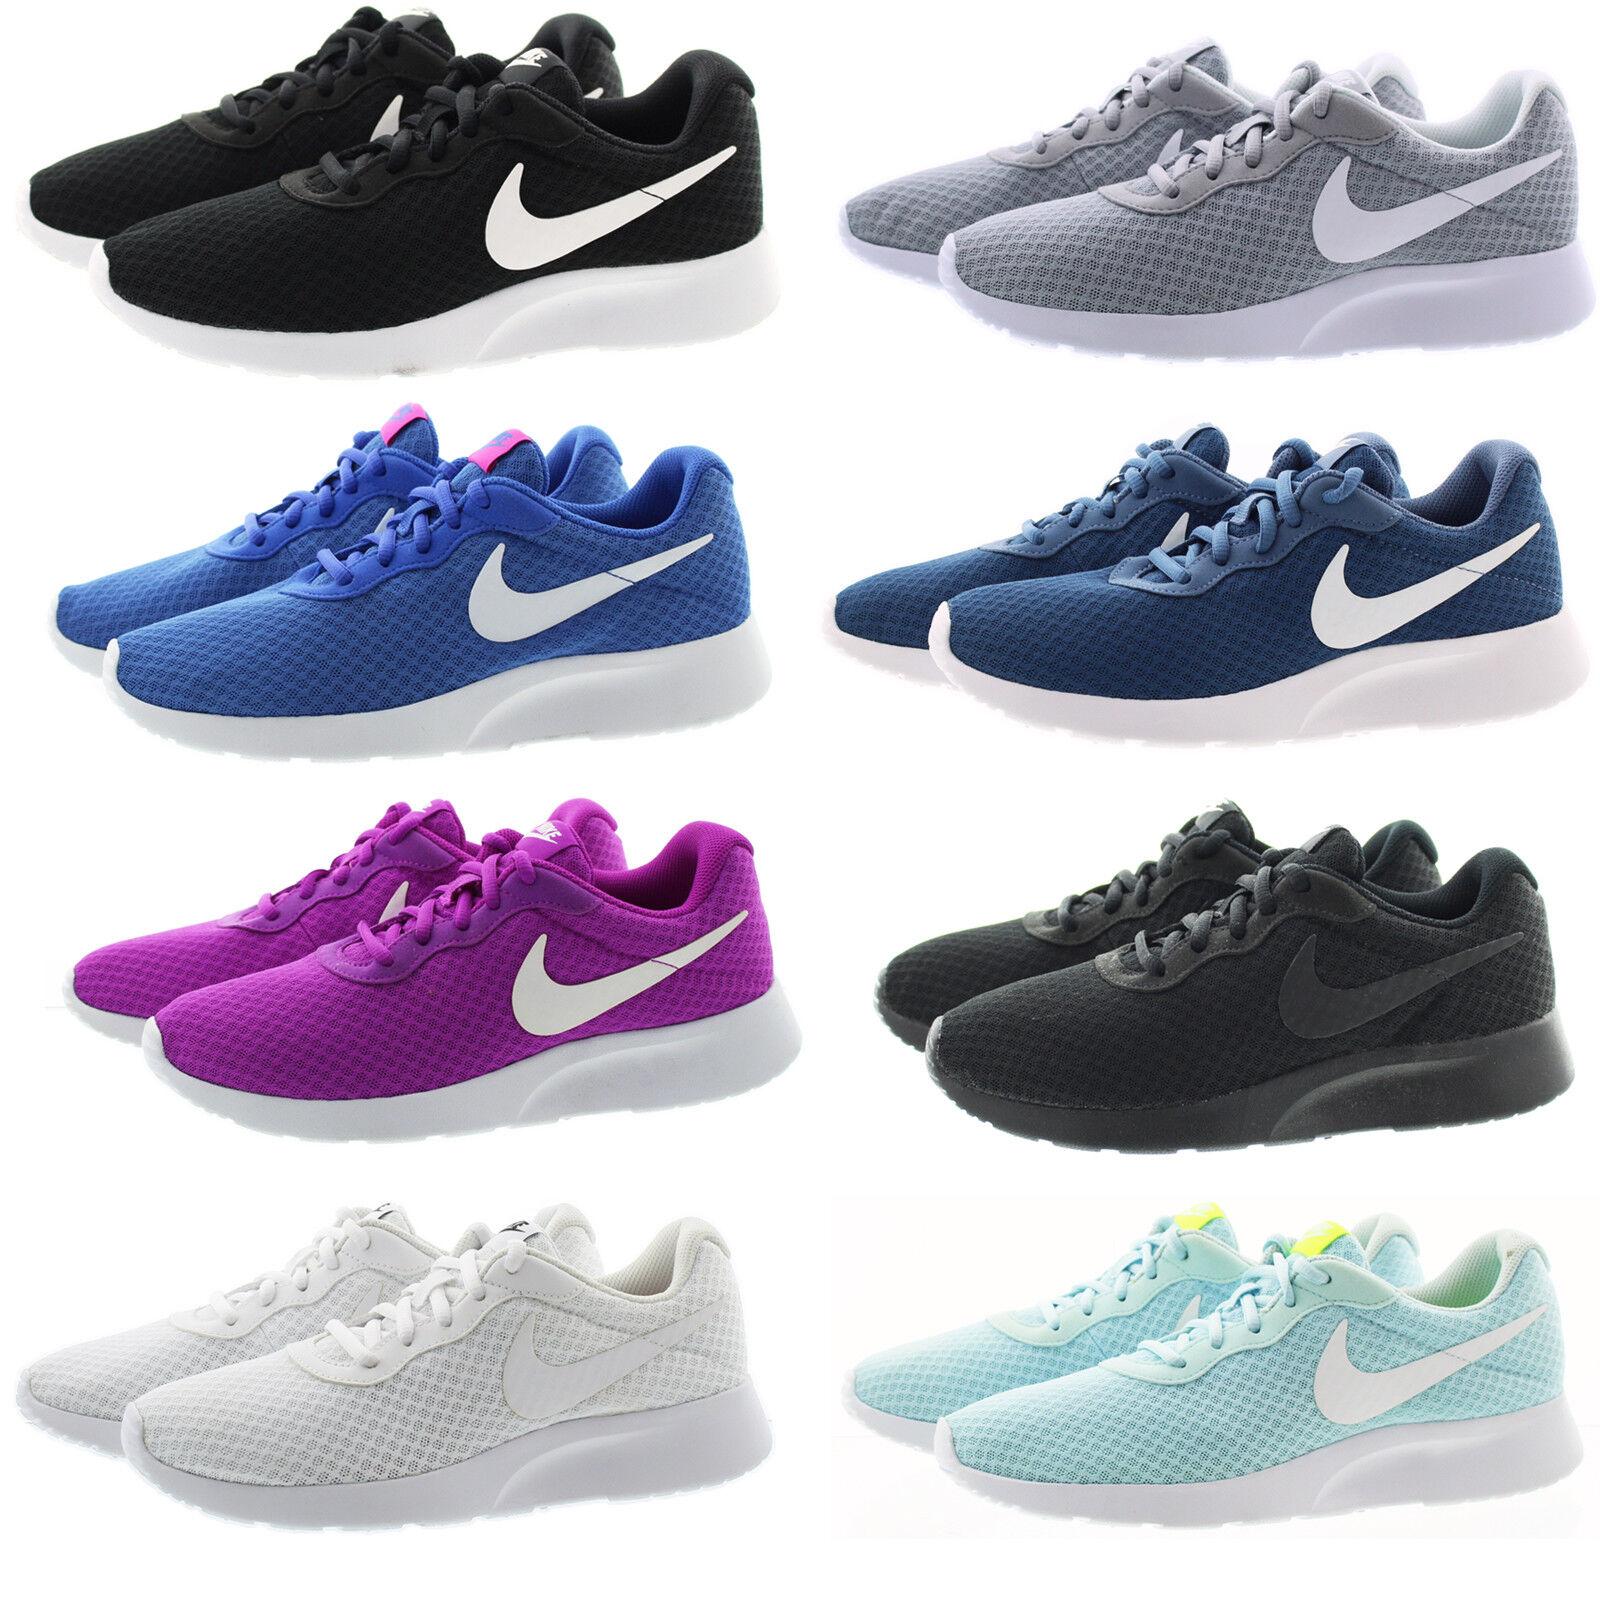 Nike 812655 Womens Tanjun Athletic Performance Running Shoes Sneakers